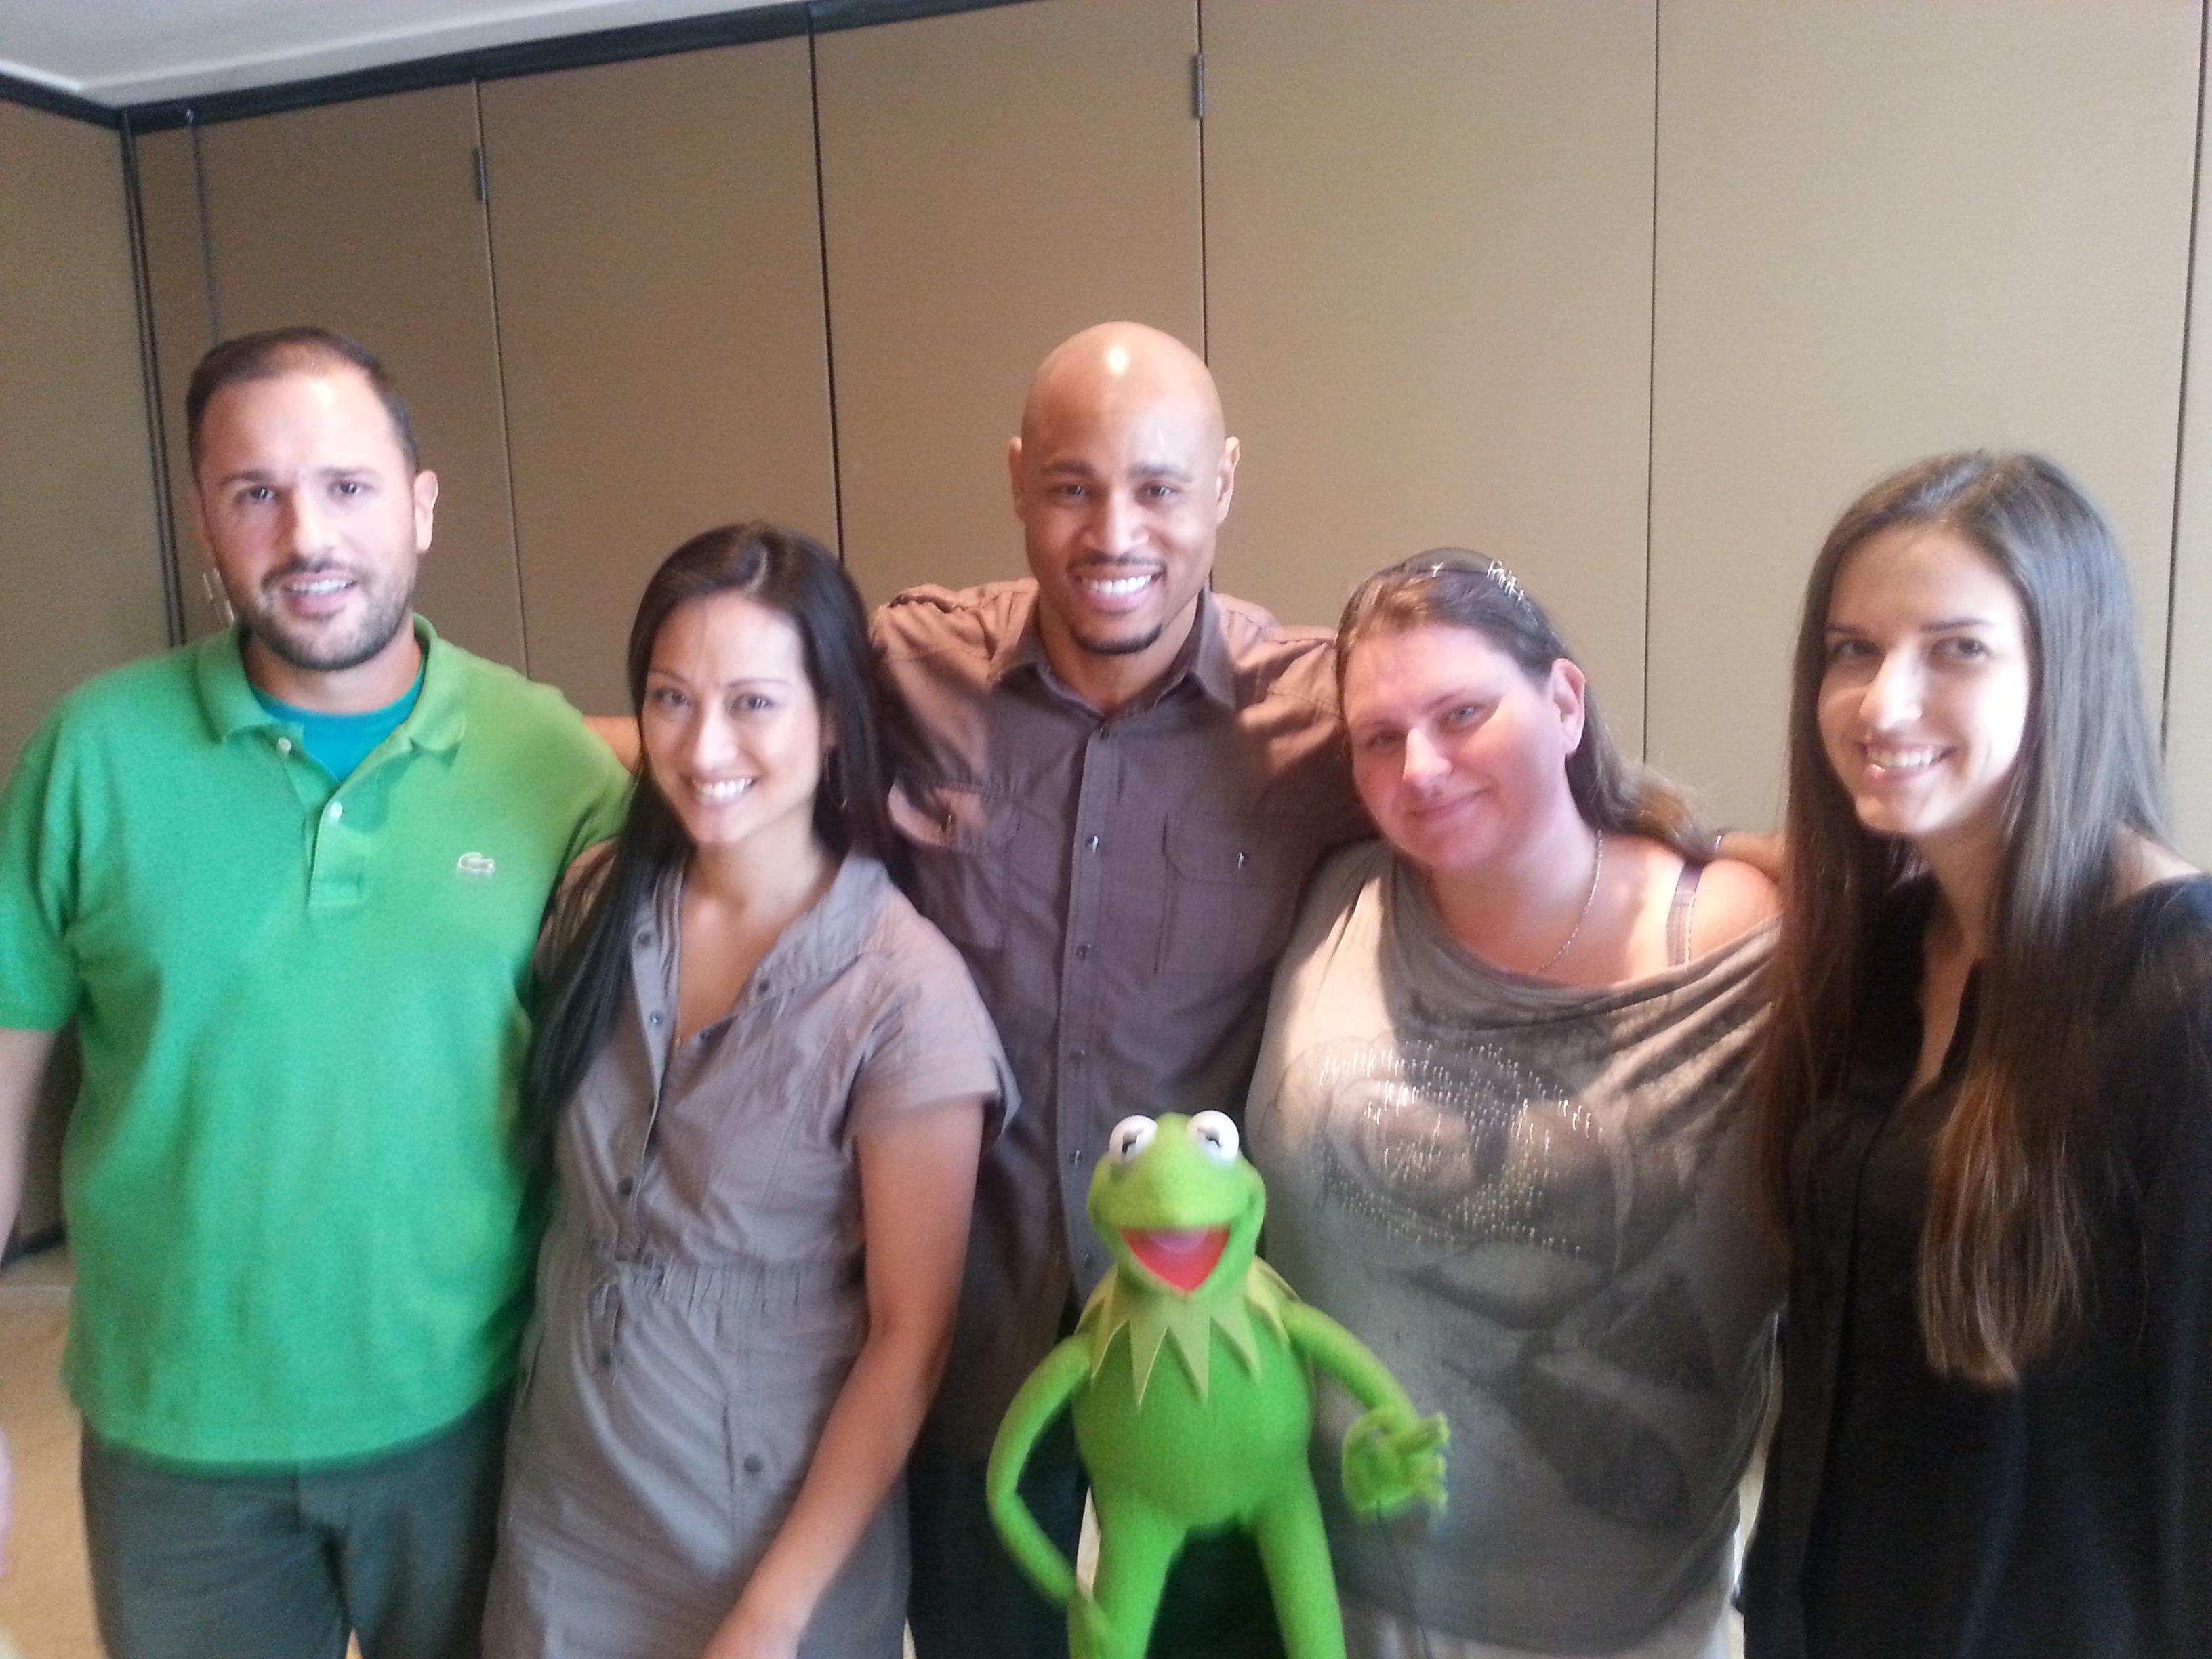 Kermit the Frog Interview